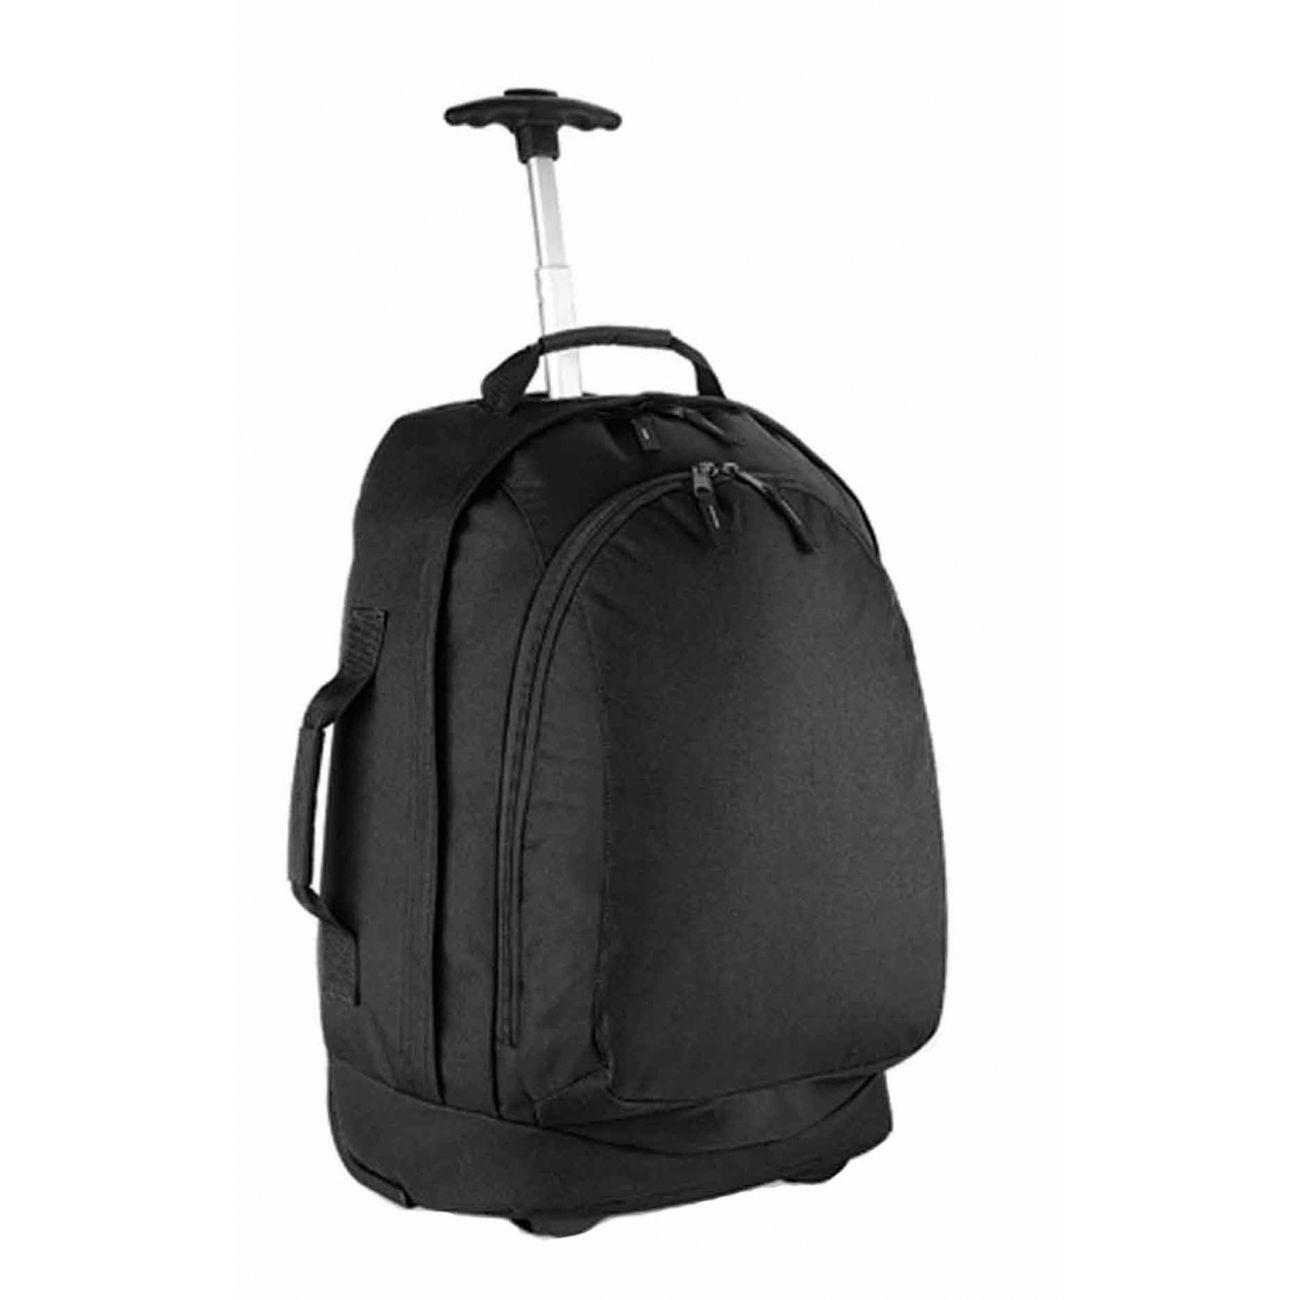 Airporter Cabine Base Bag Bagagerie Noir Valise TrolleyClassic Bg25 VqpGzMSU